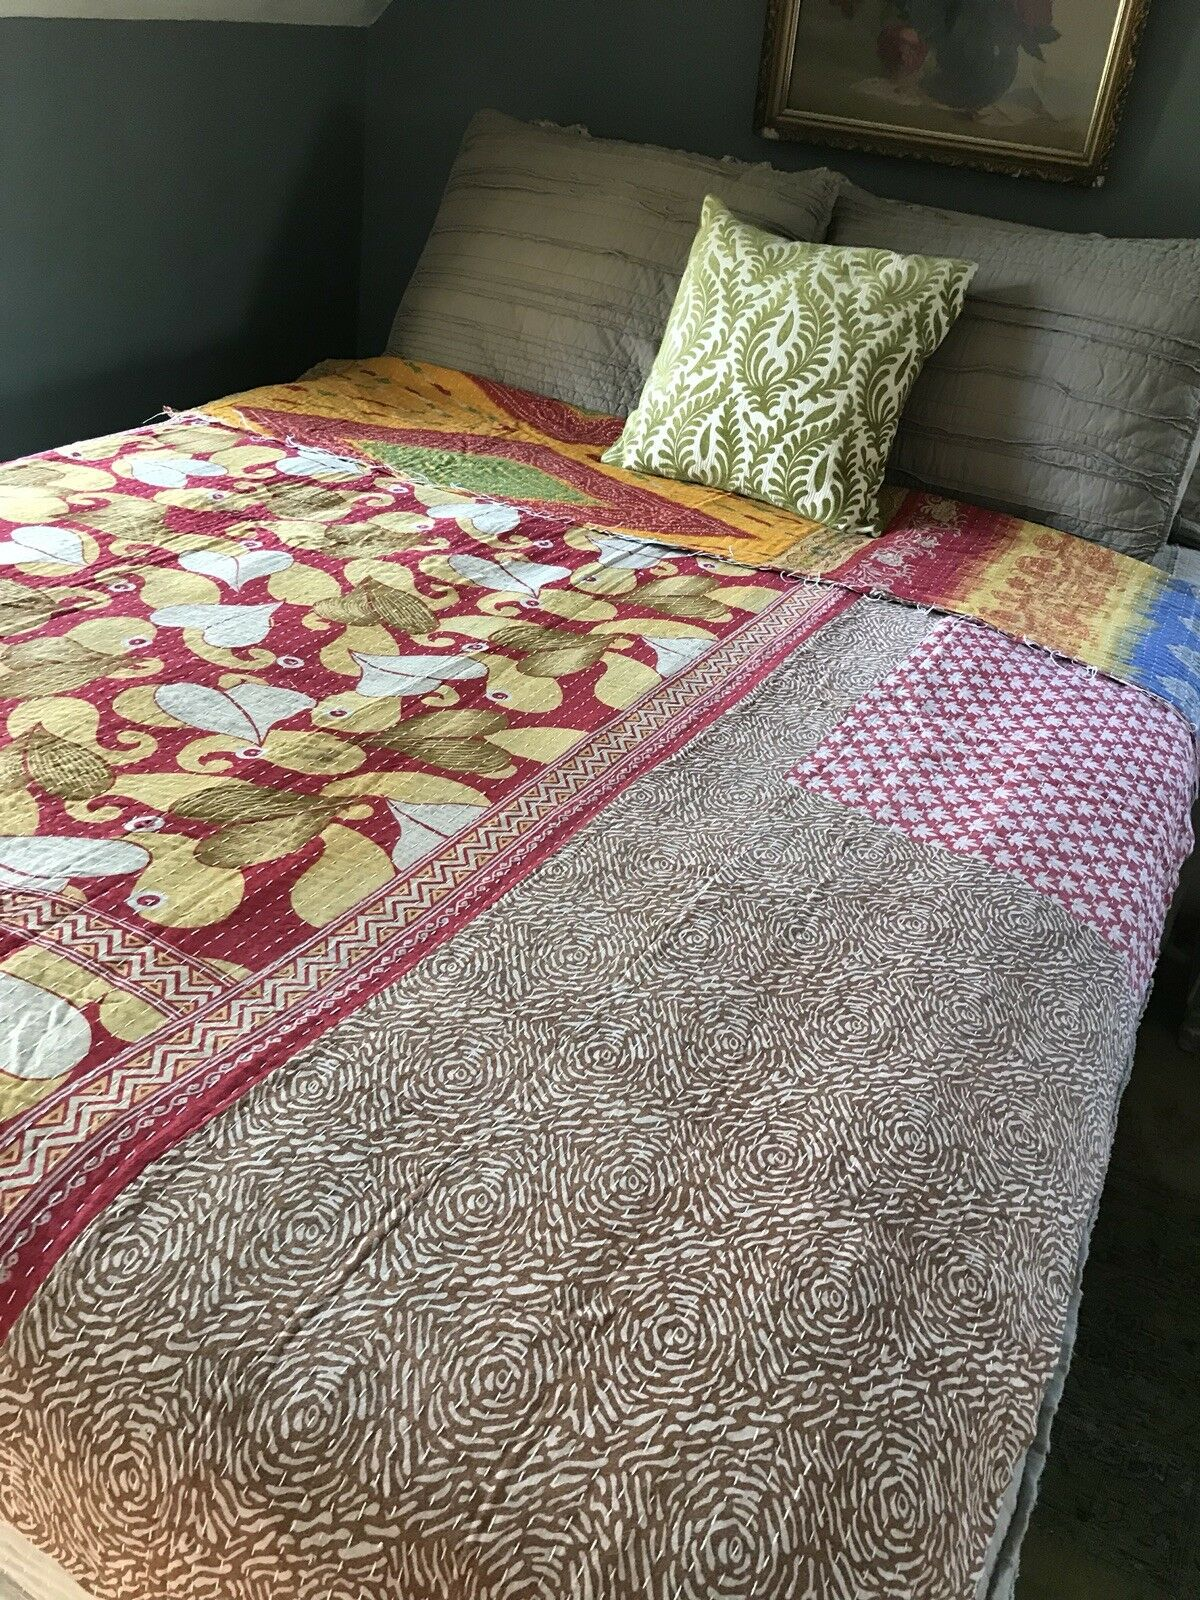 Vintage Kantha Quilt. Indian Sari Patchwork Throw. Twin Bohemian Bettspread.